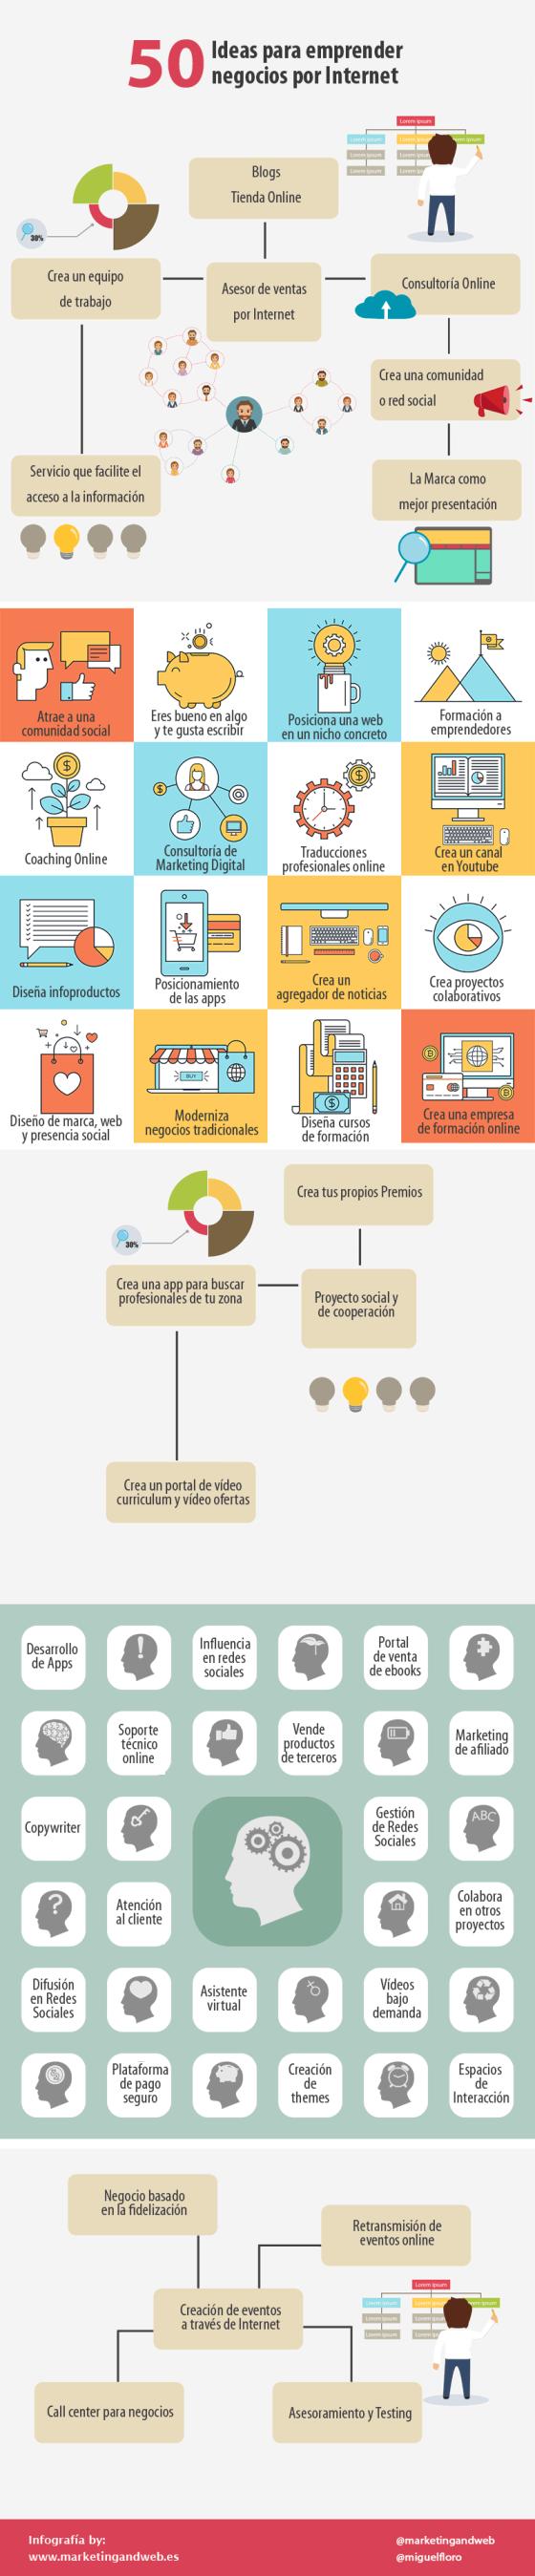 50 ideas para emprender negocios por Internet